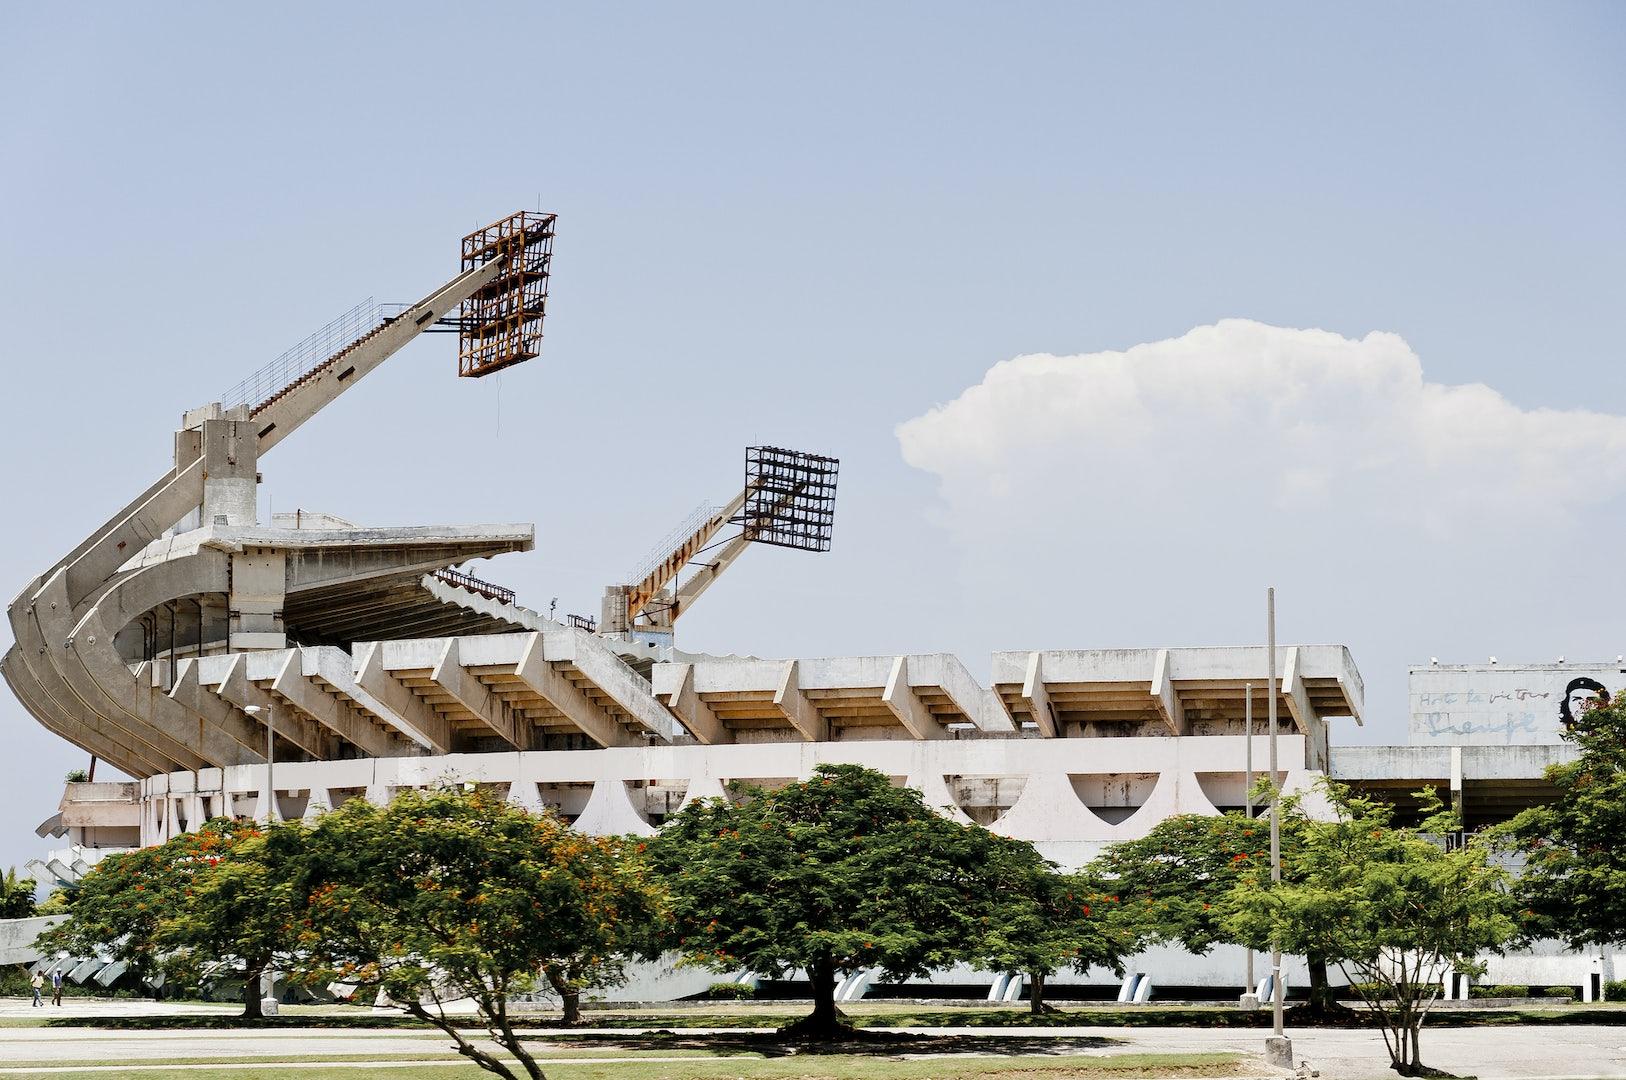 view of Estadio Panamericano